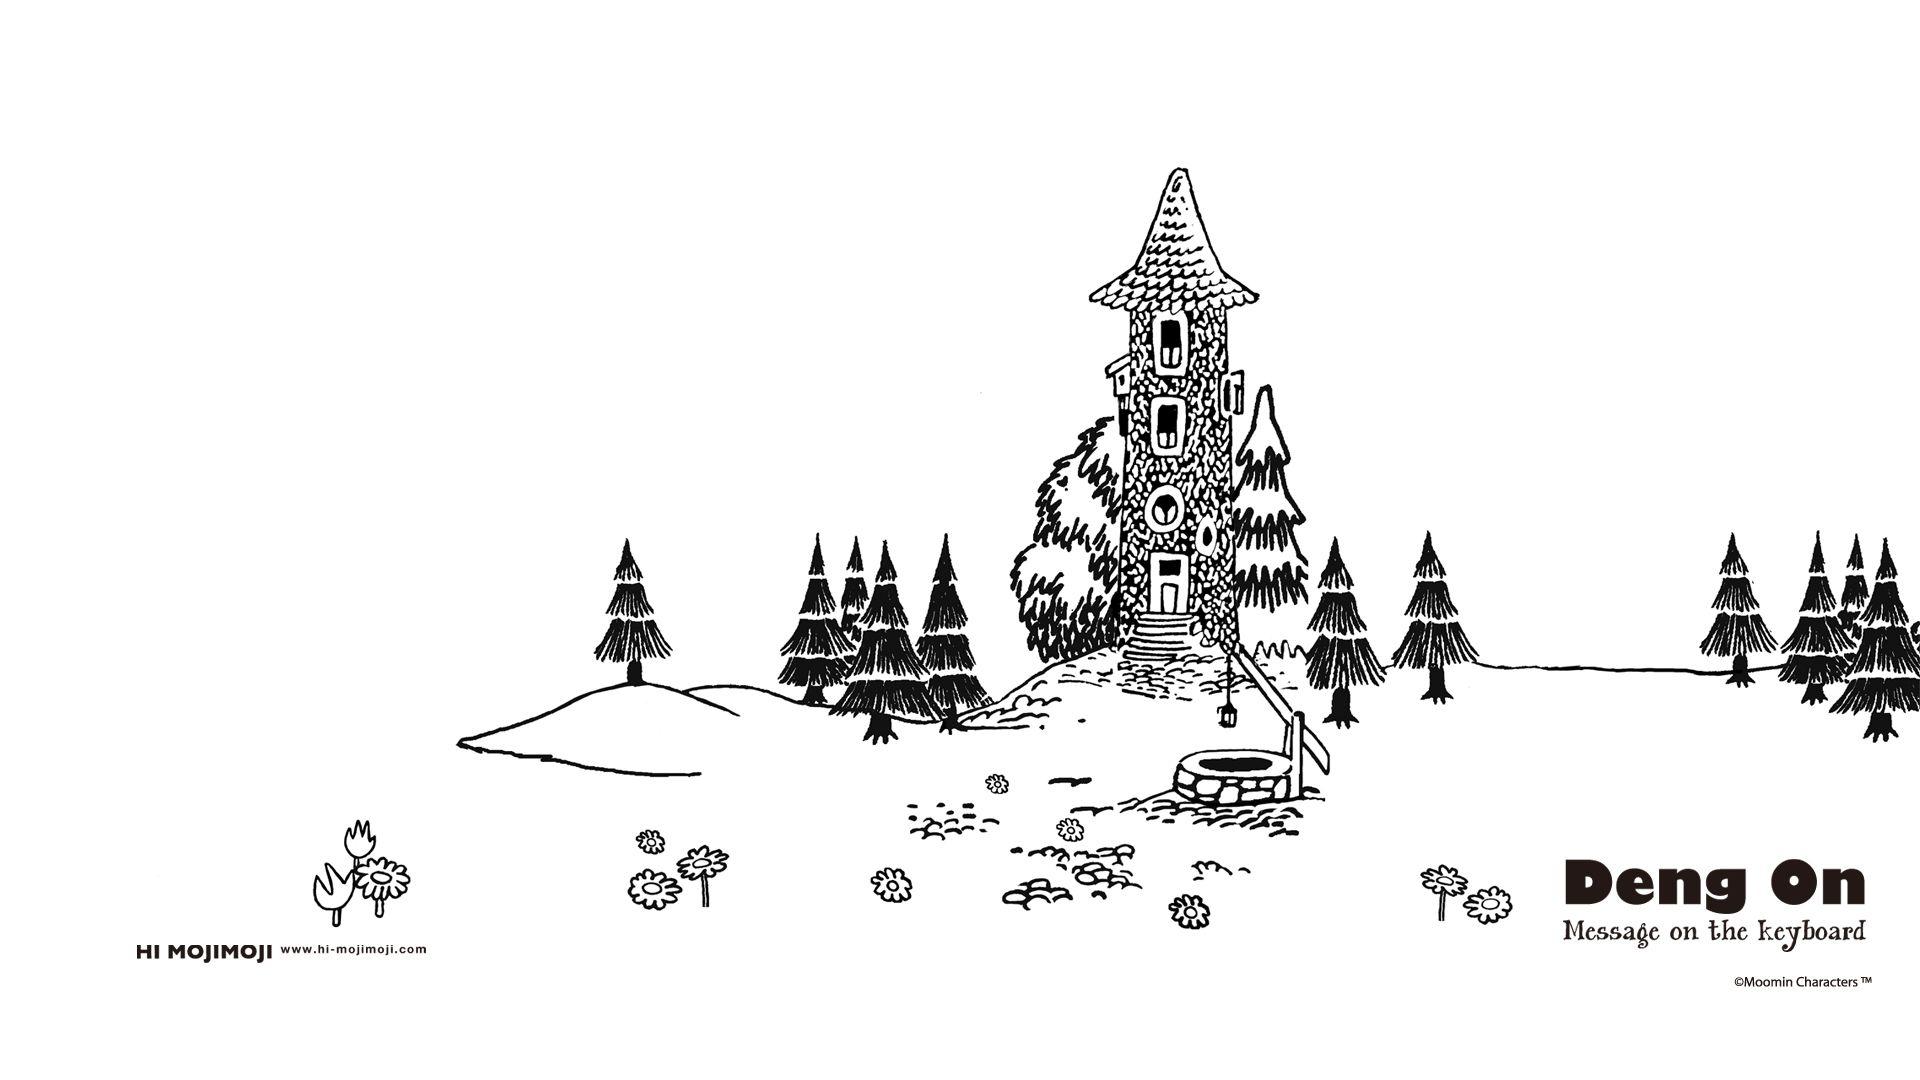 All Things Moomin スナフキン 壁紙 ムーミン公式サイト 壁紙